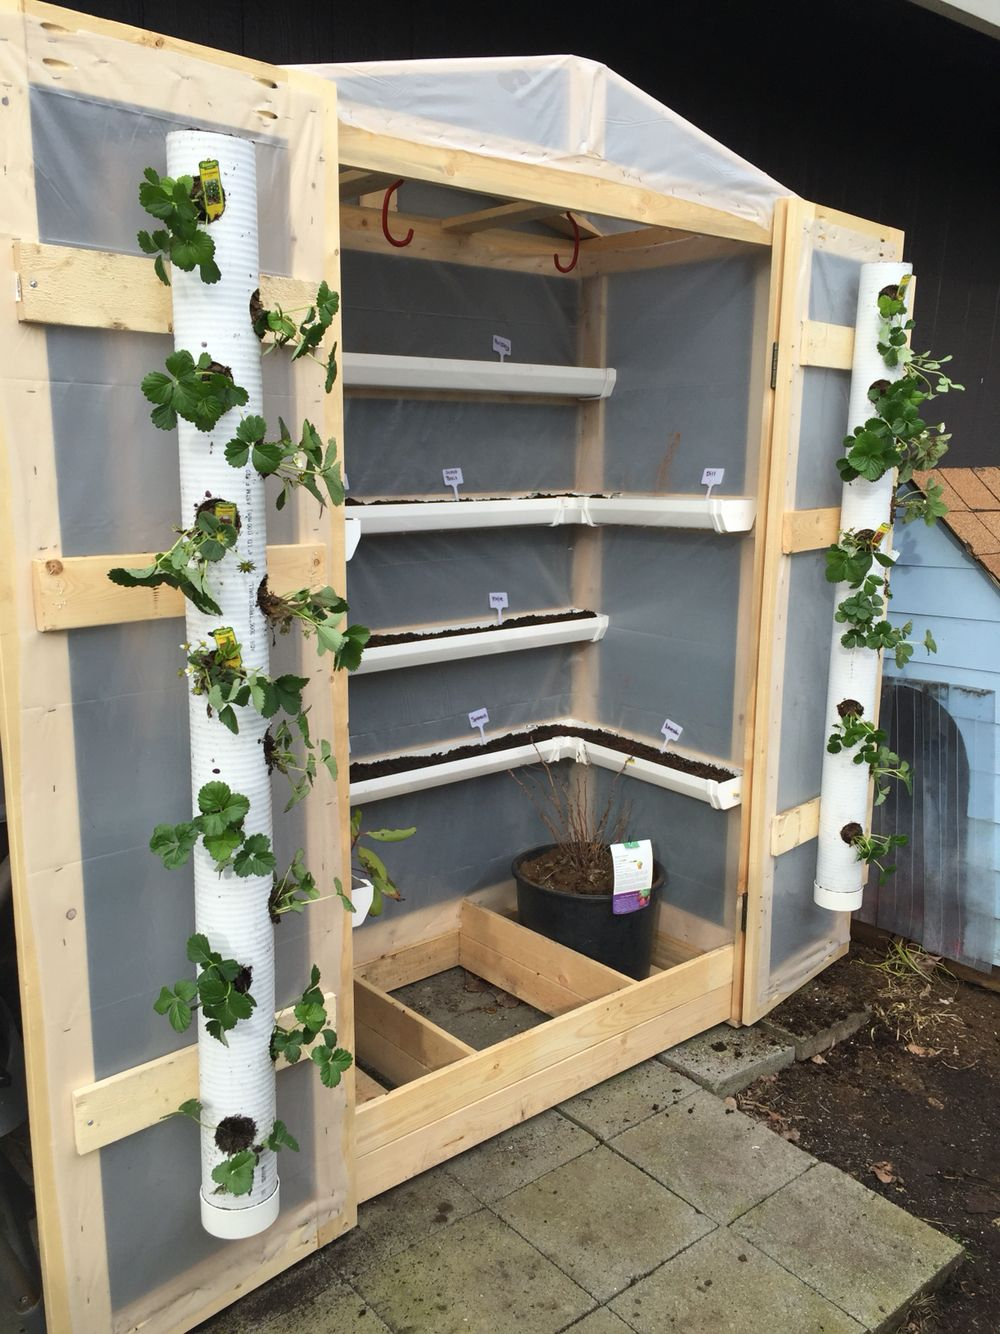 Greenhouse With Pvc Pipe And Gutters   Jardinage   Jardins ... dedans Pot Pvc Jardin